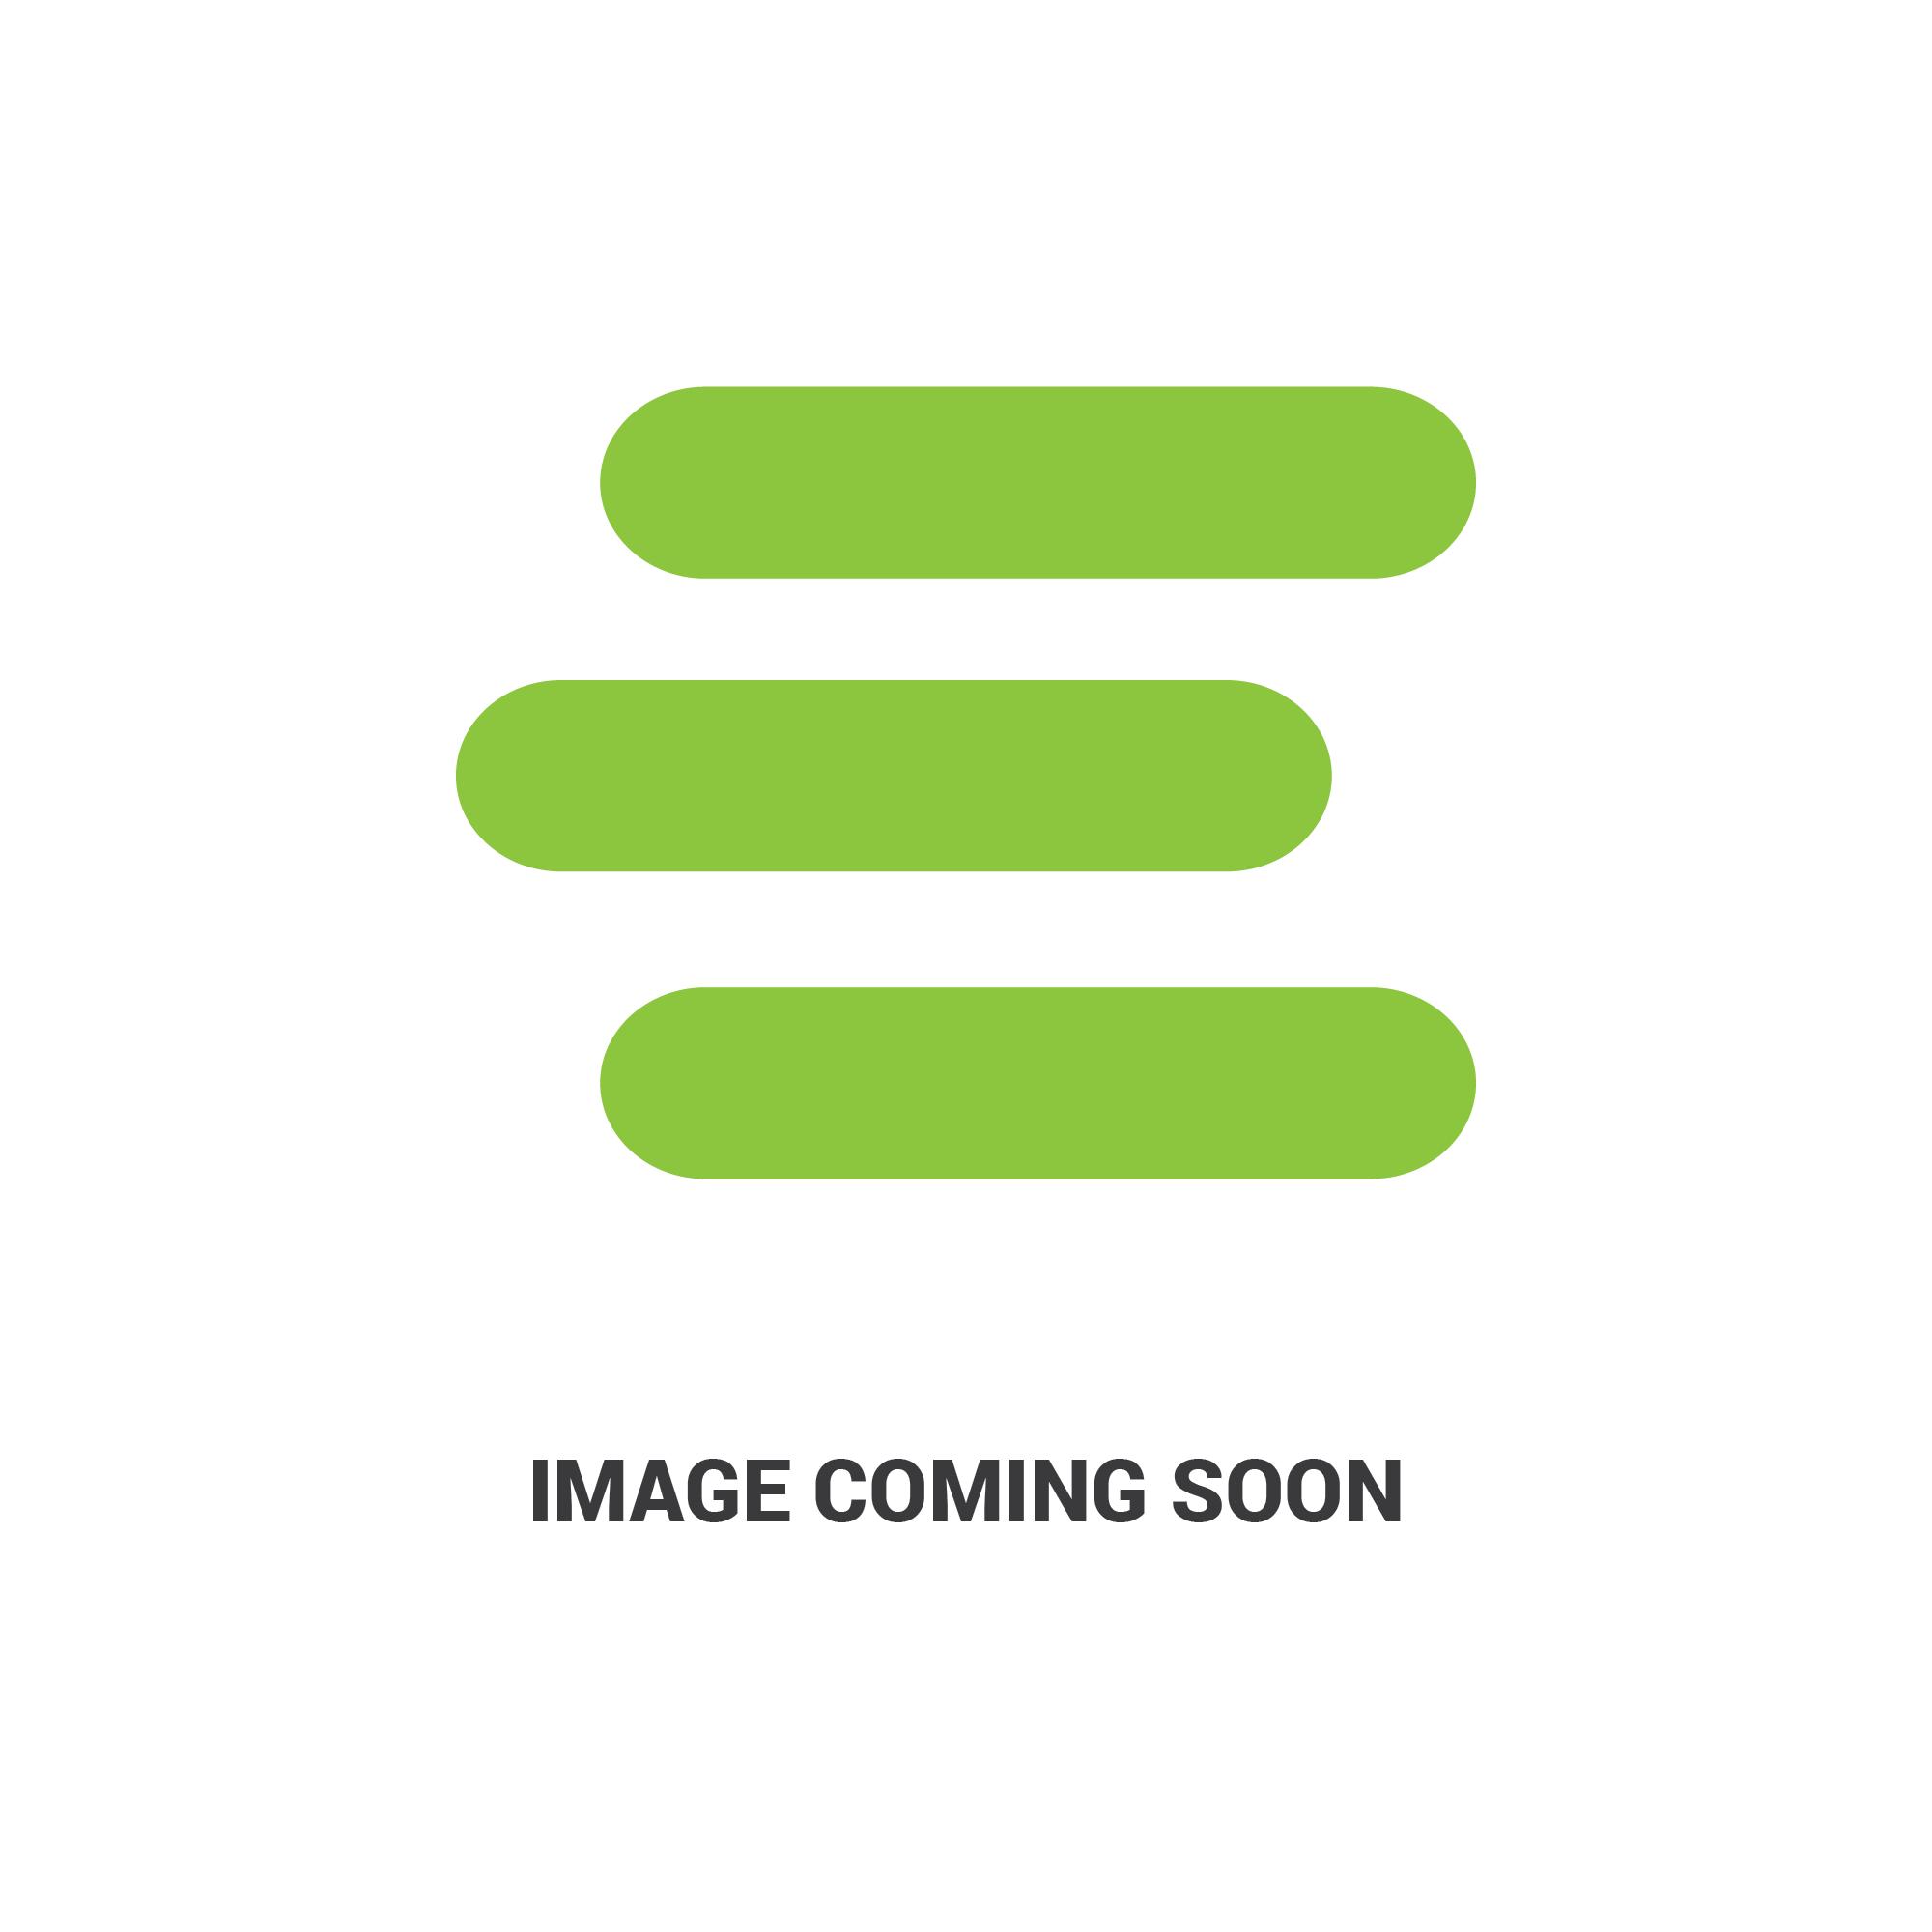 E-6675176edit 1.jpg